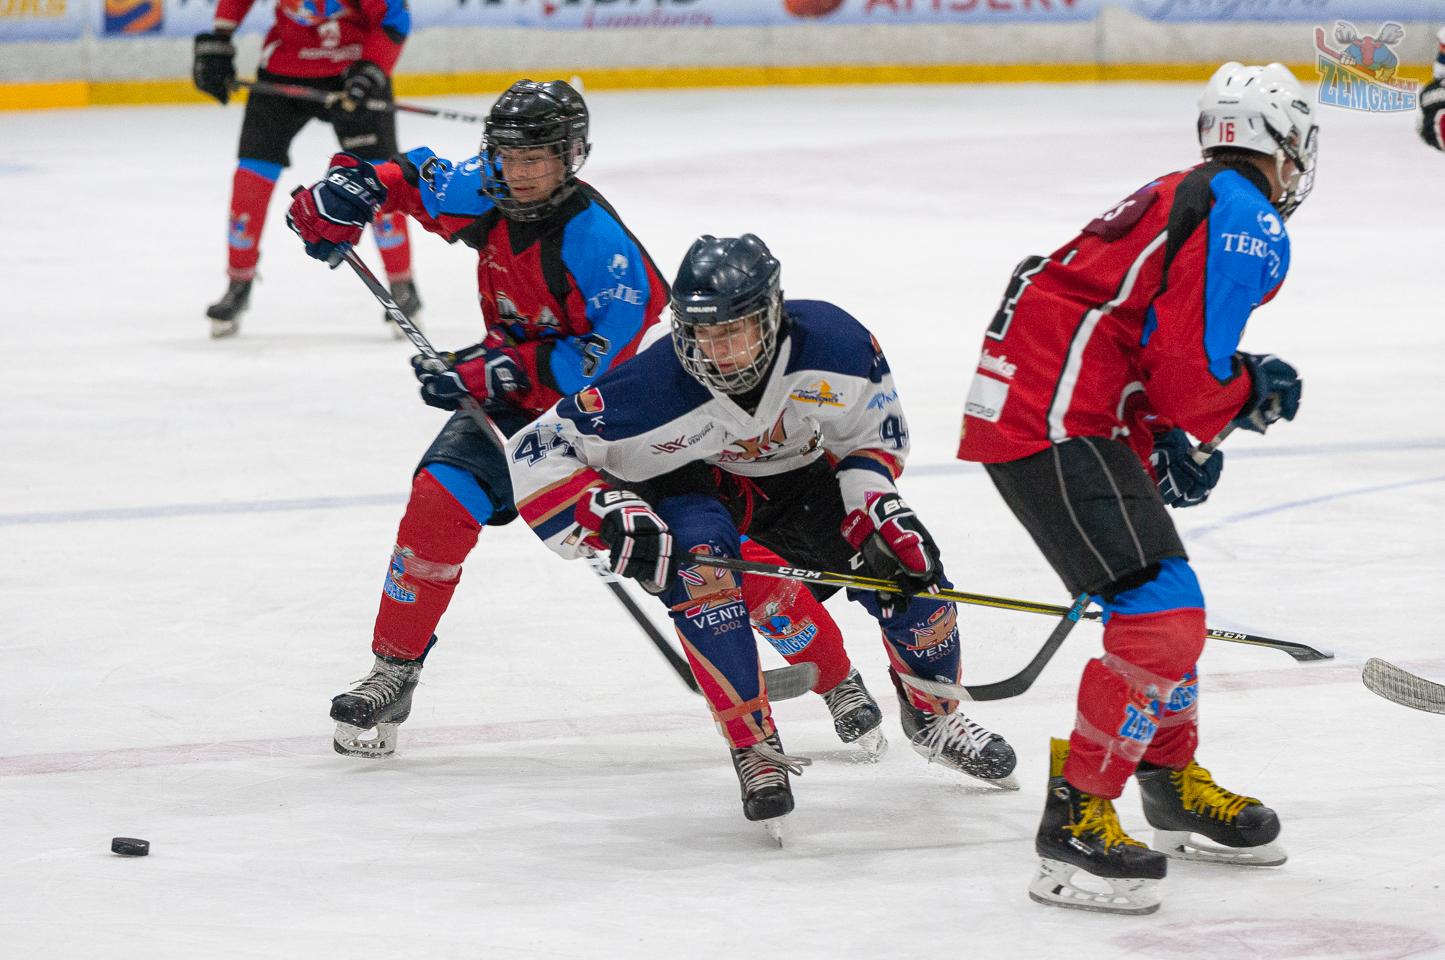 Jelgavas hokeja skola JLSS U17 - Venta 2002 14092019-22